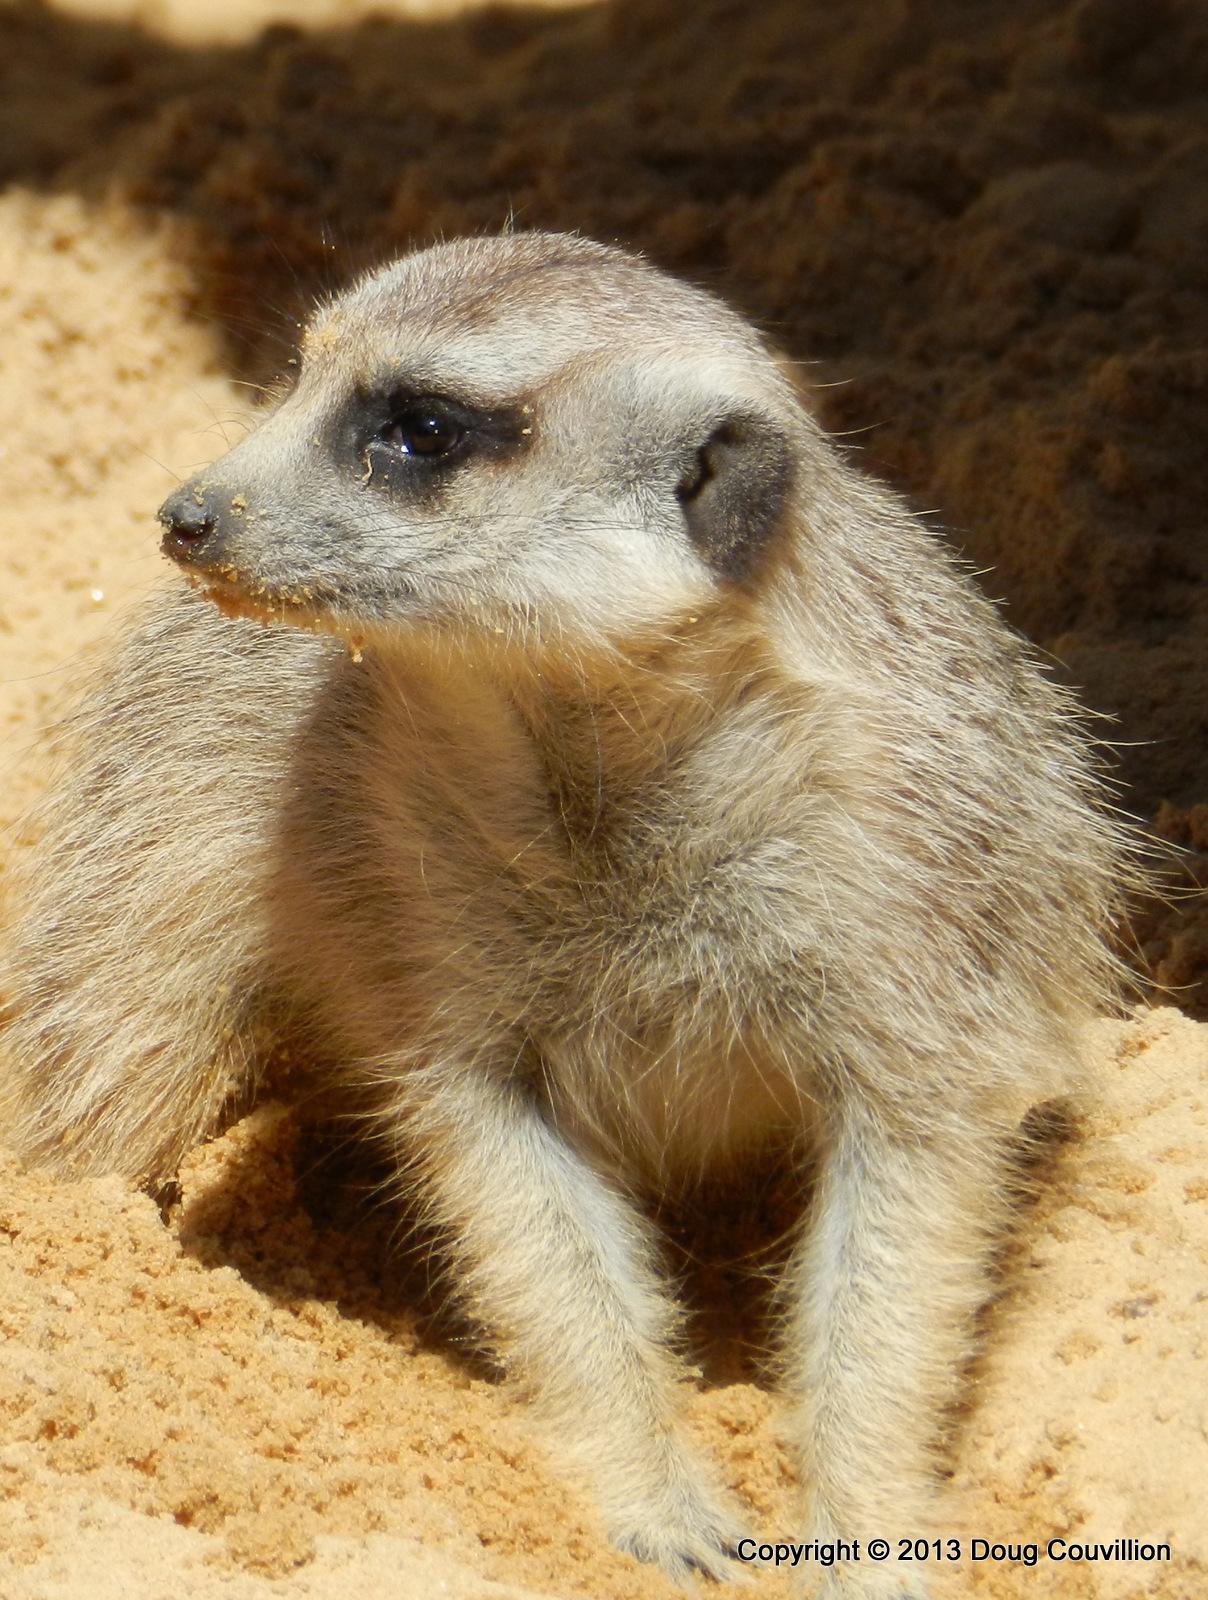 photograph of a meerkat